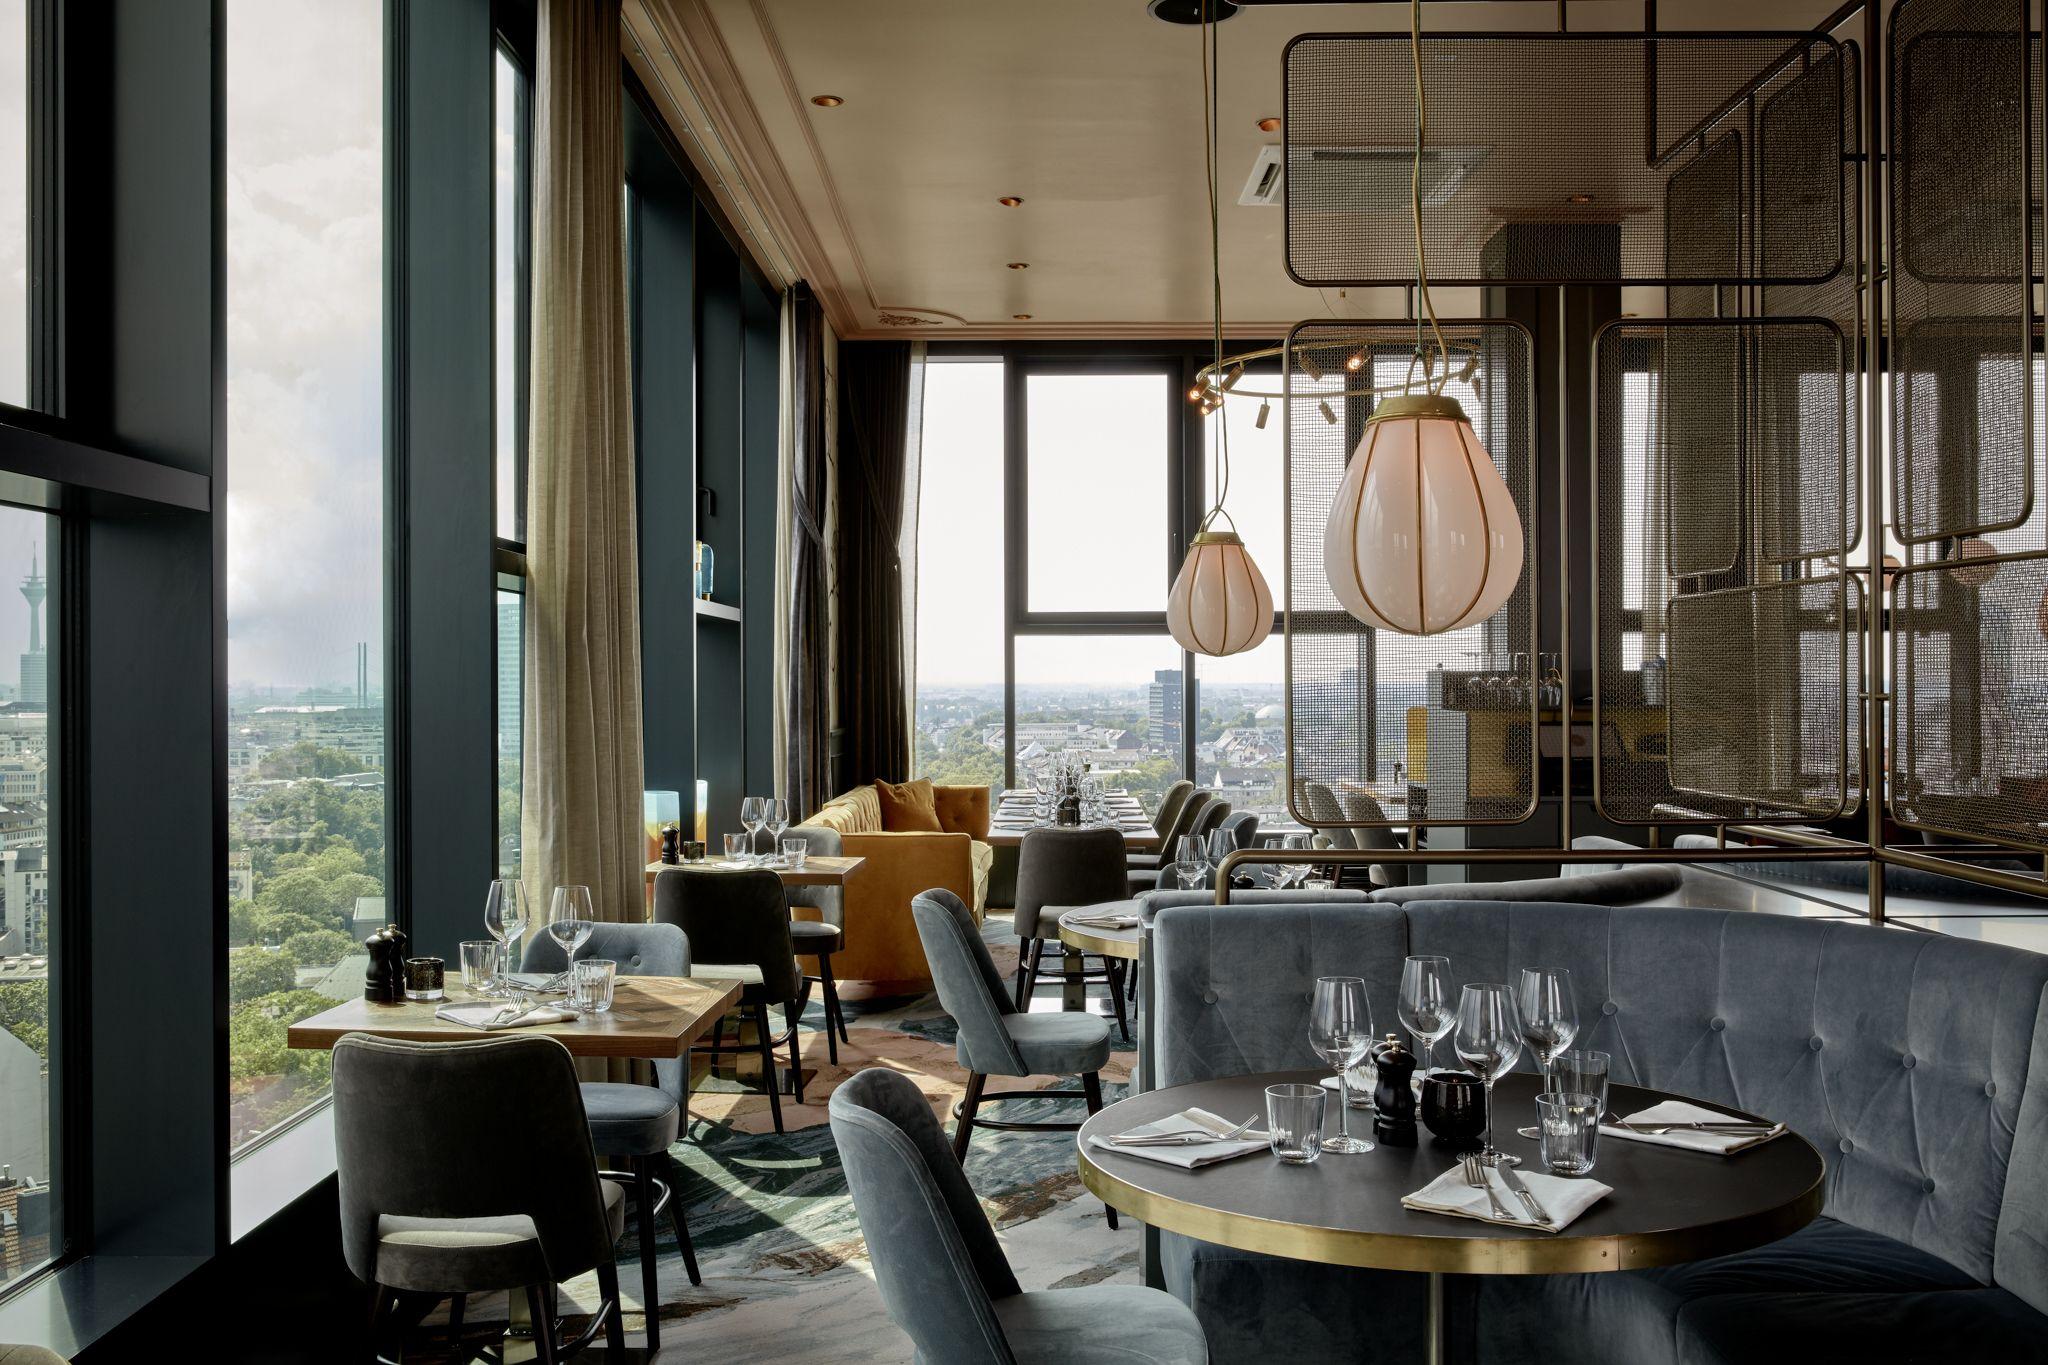 The Paris Club im 25hours Hotel Düsseldorf Das Tour